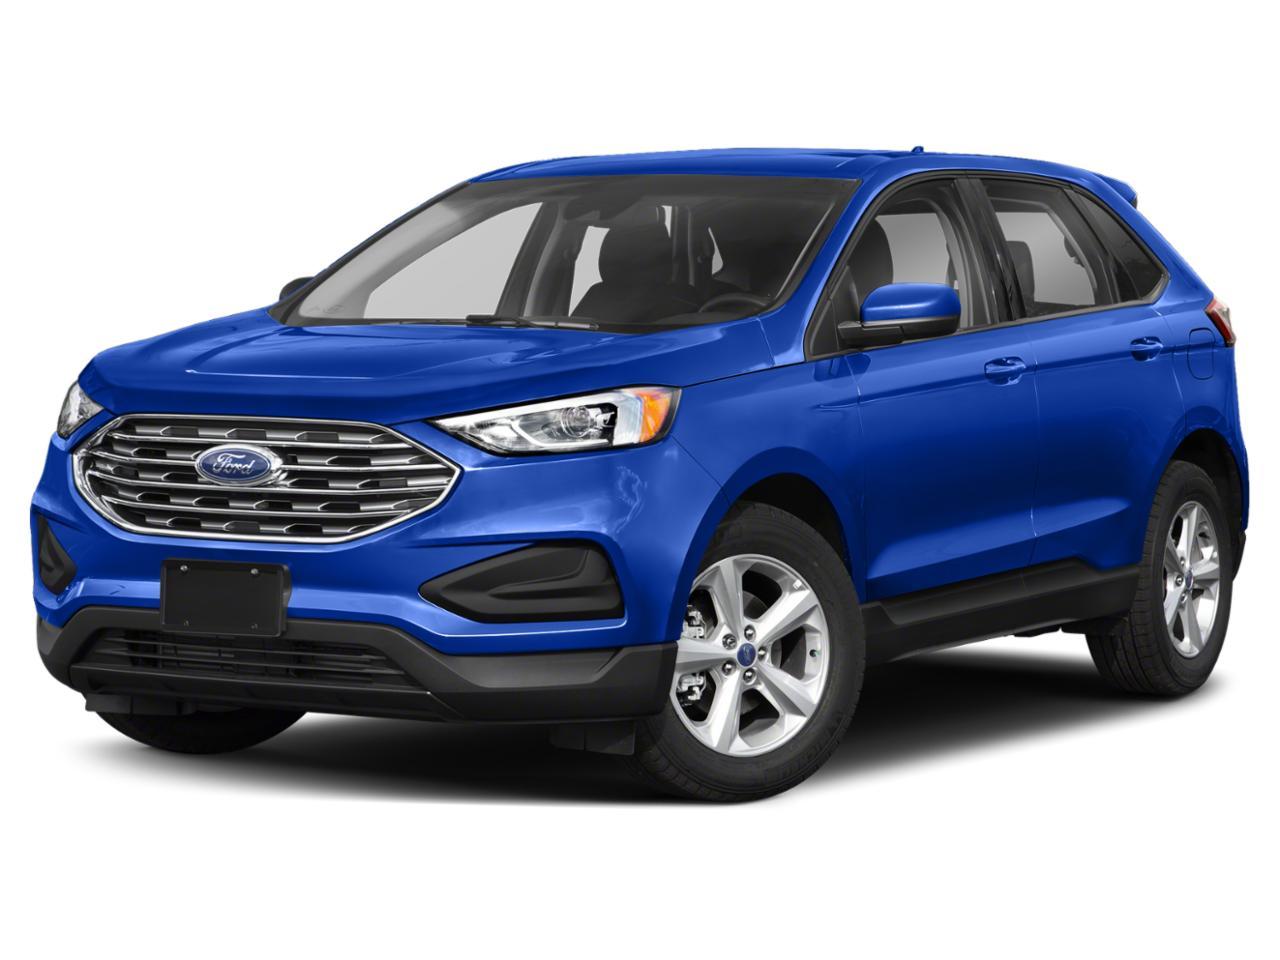 2020 Ford Edge Vehicle Photo in Oshkosh, WI 54901-1209